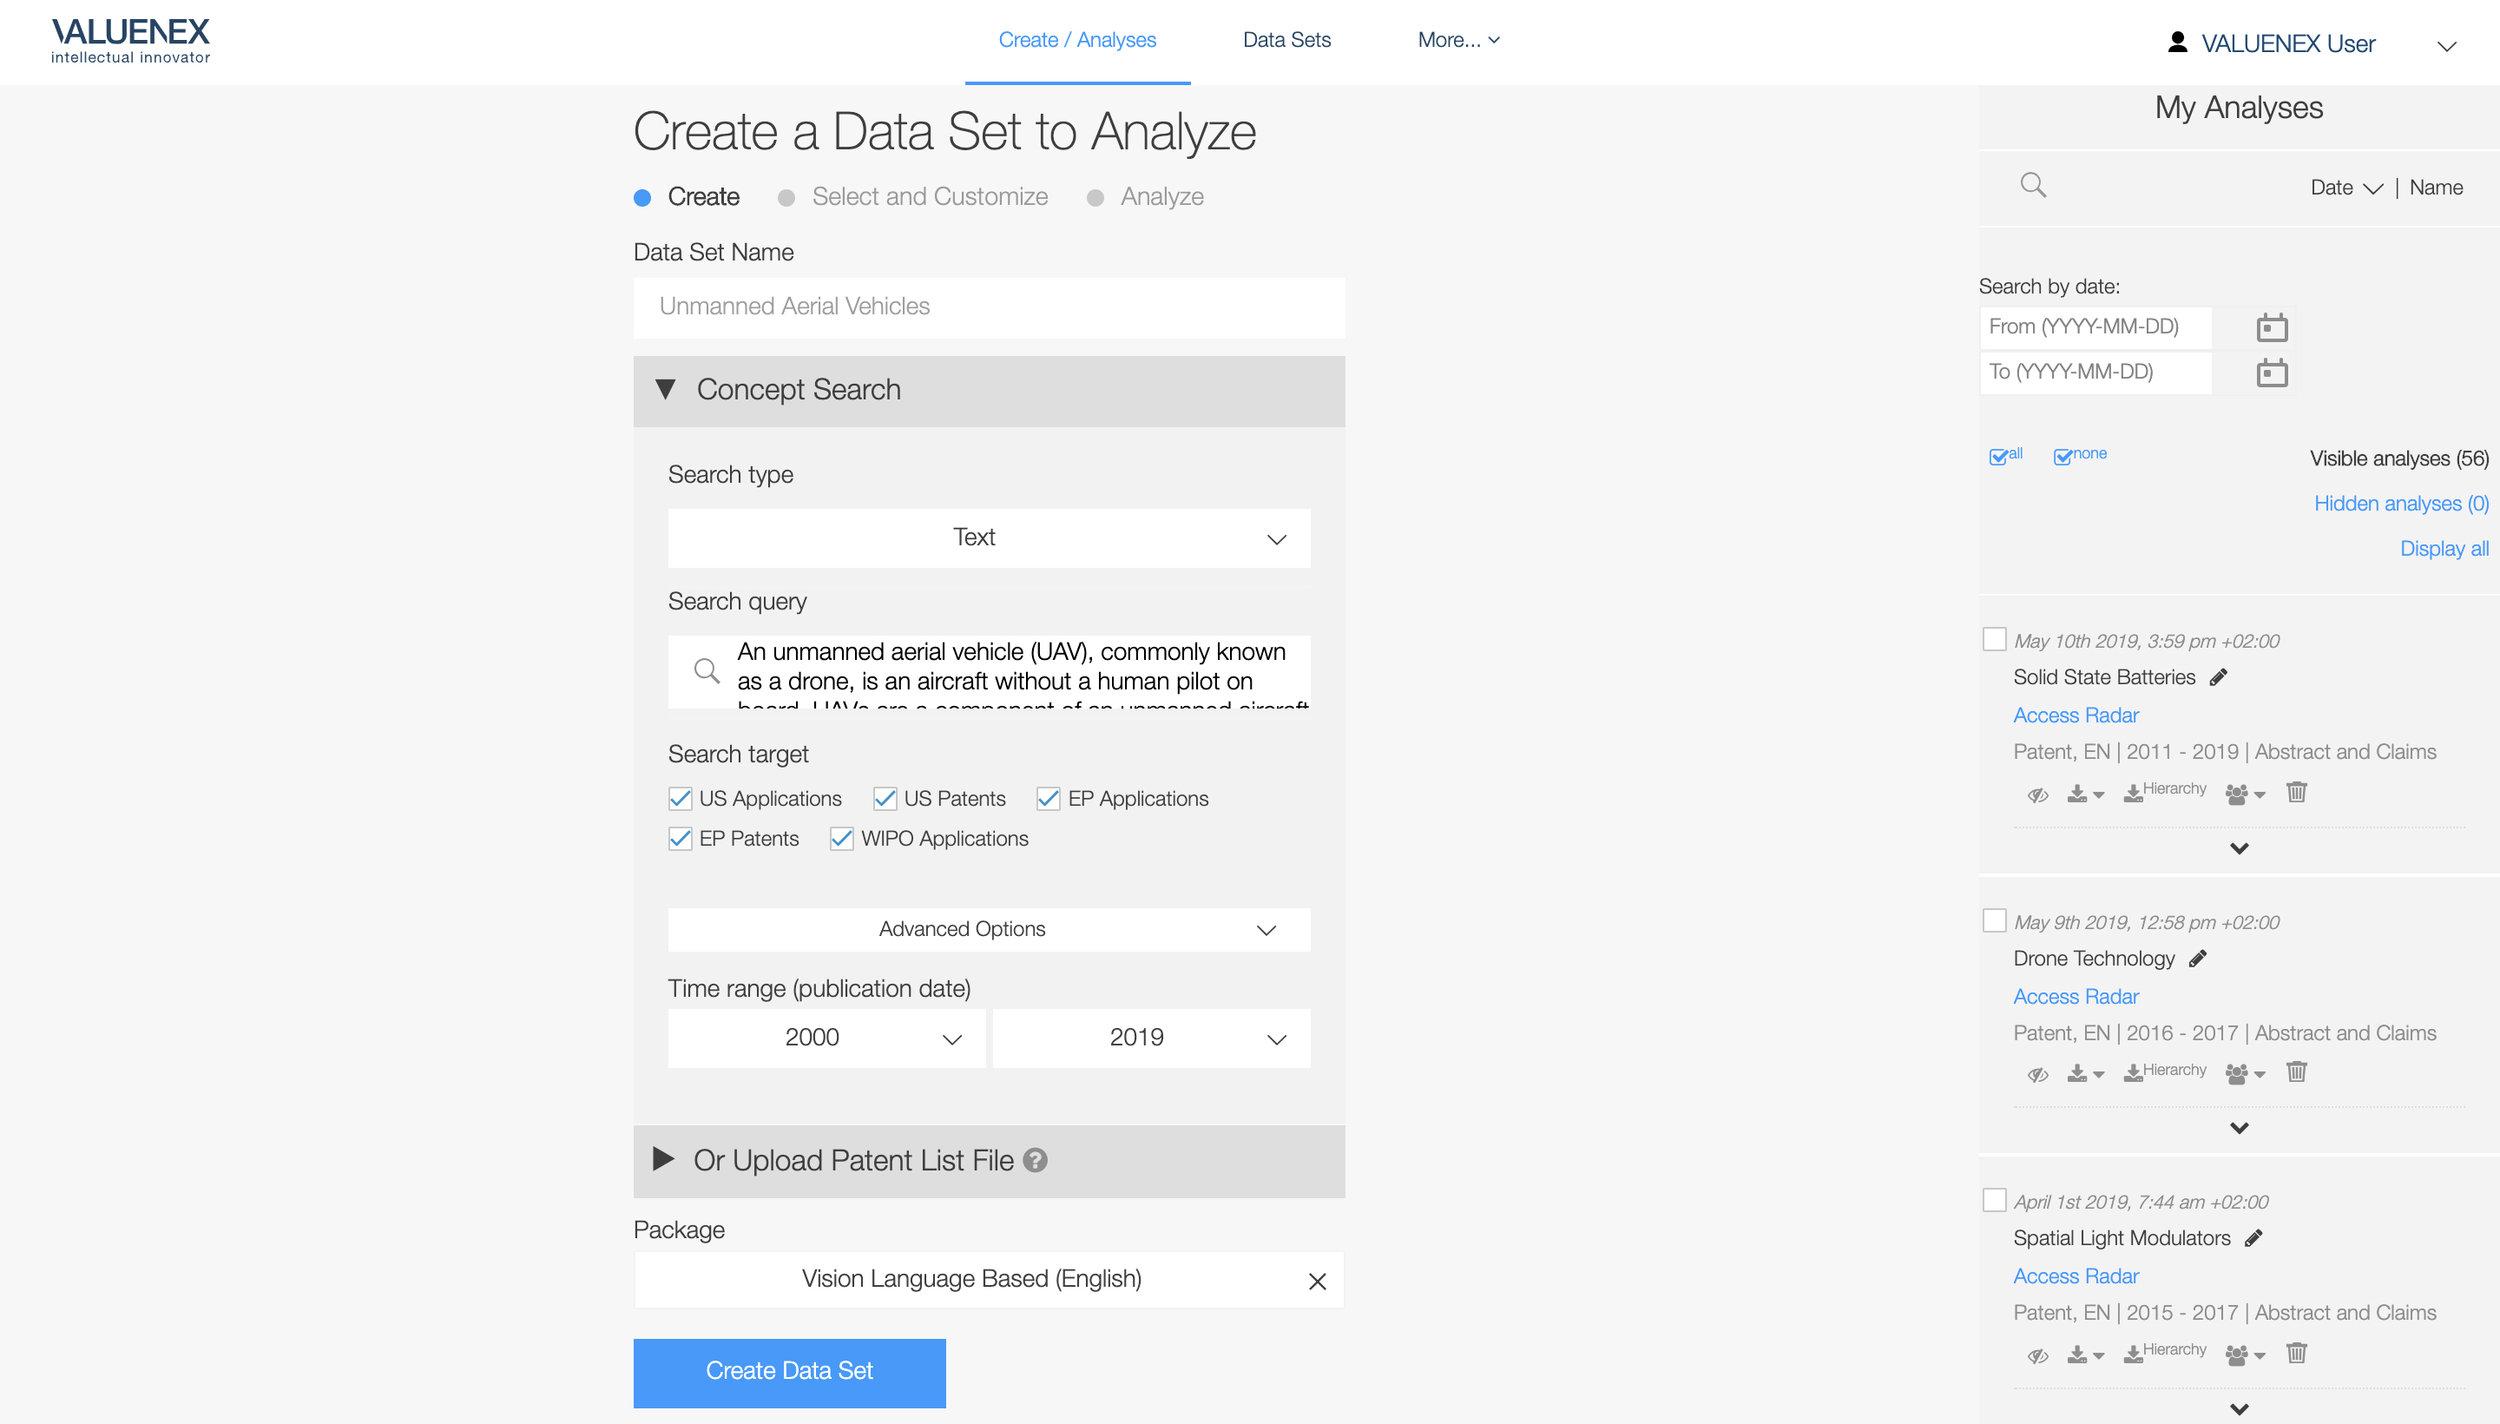 Patent - Create a Data Set.jpg